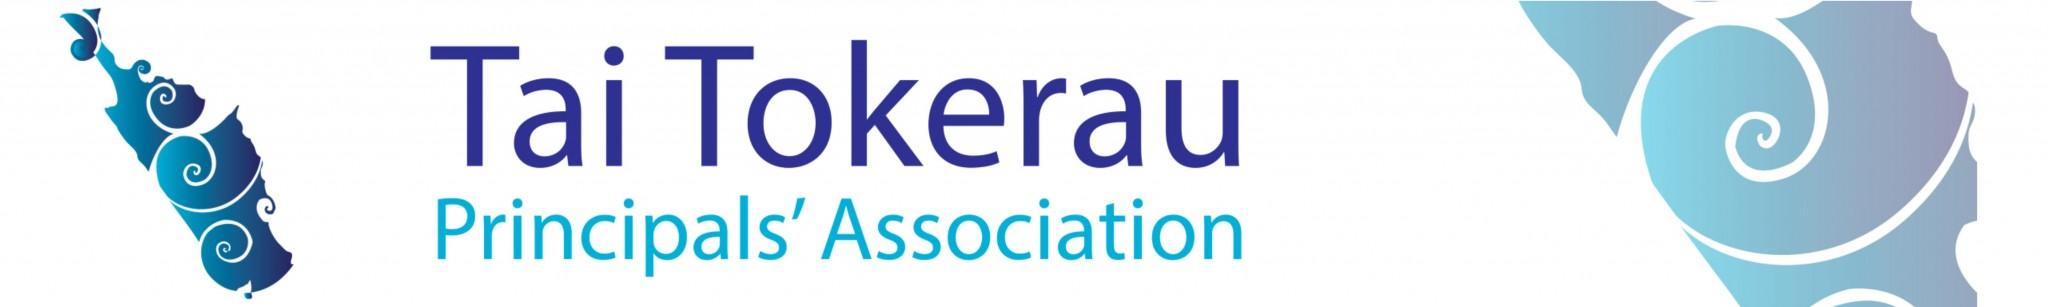 Tai Tokerau Principals' Association